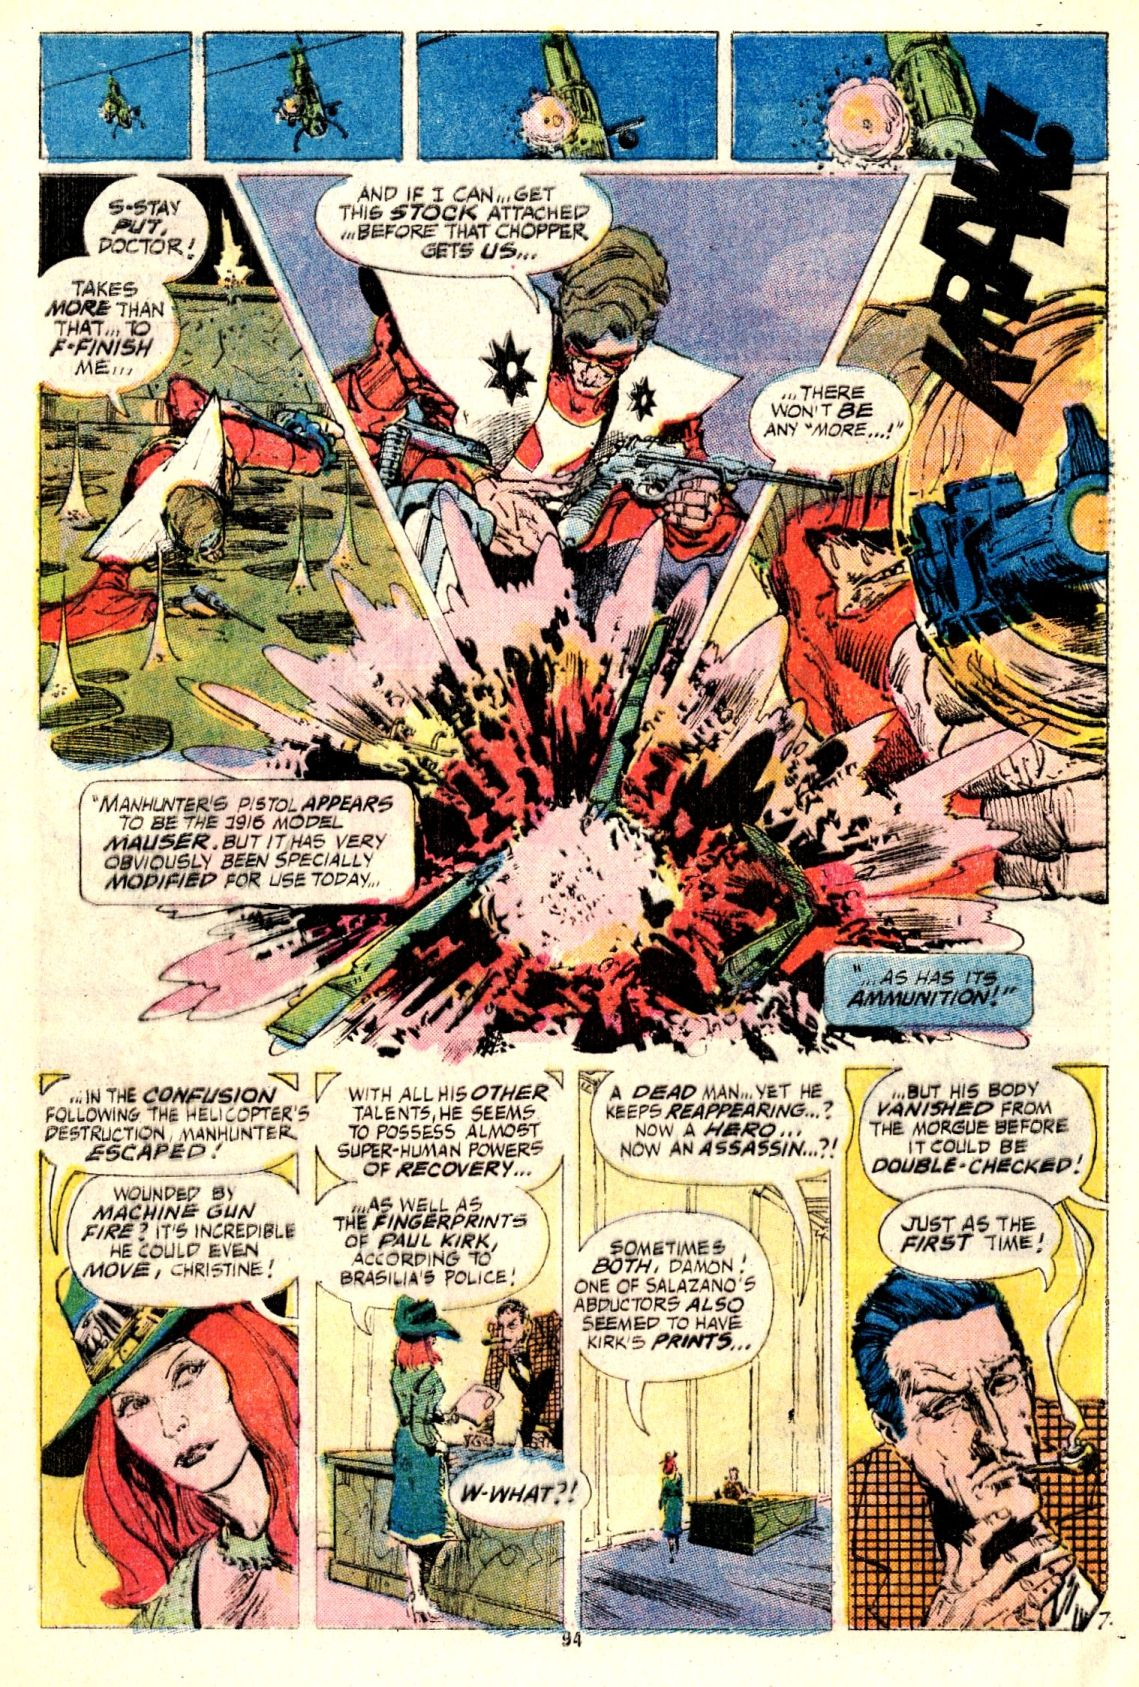 Detective Comics (1937) 438 Page 94